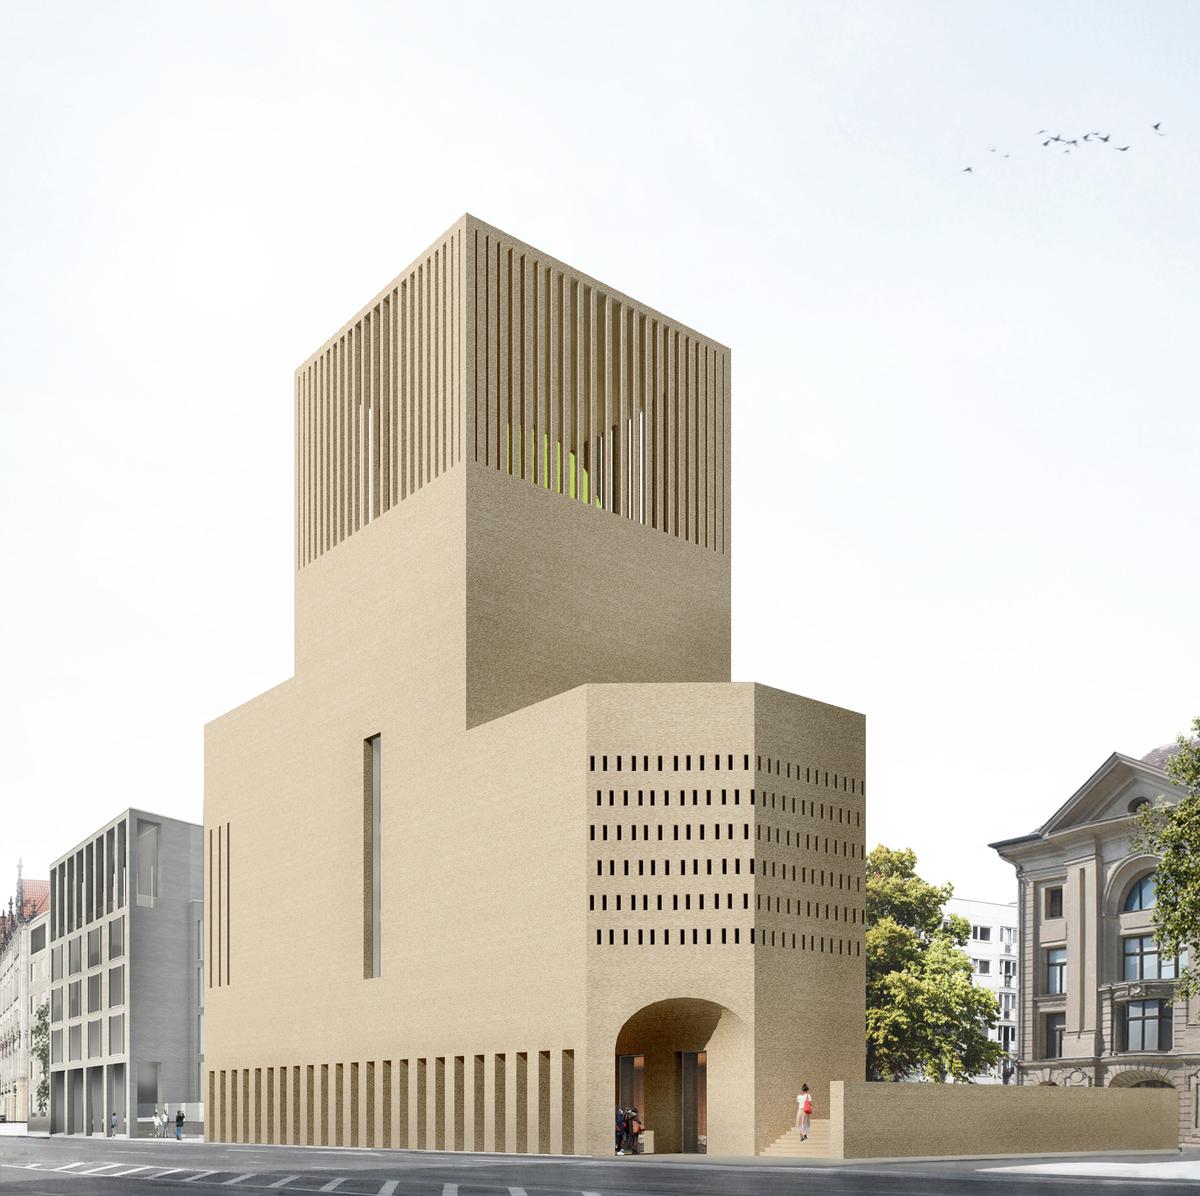 The house of one view from gertraudenstrasse kuehn malvezzi visualization davide abbonacci kuehn malvezzi